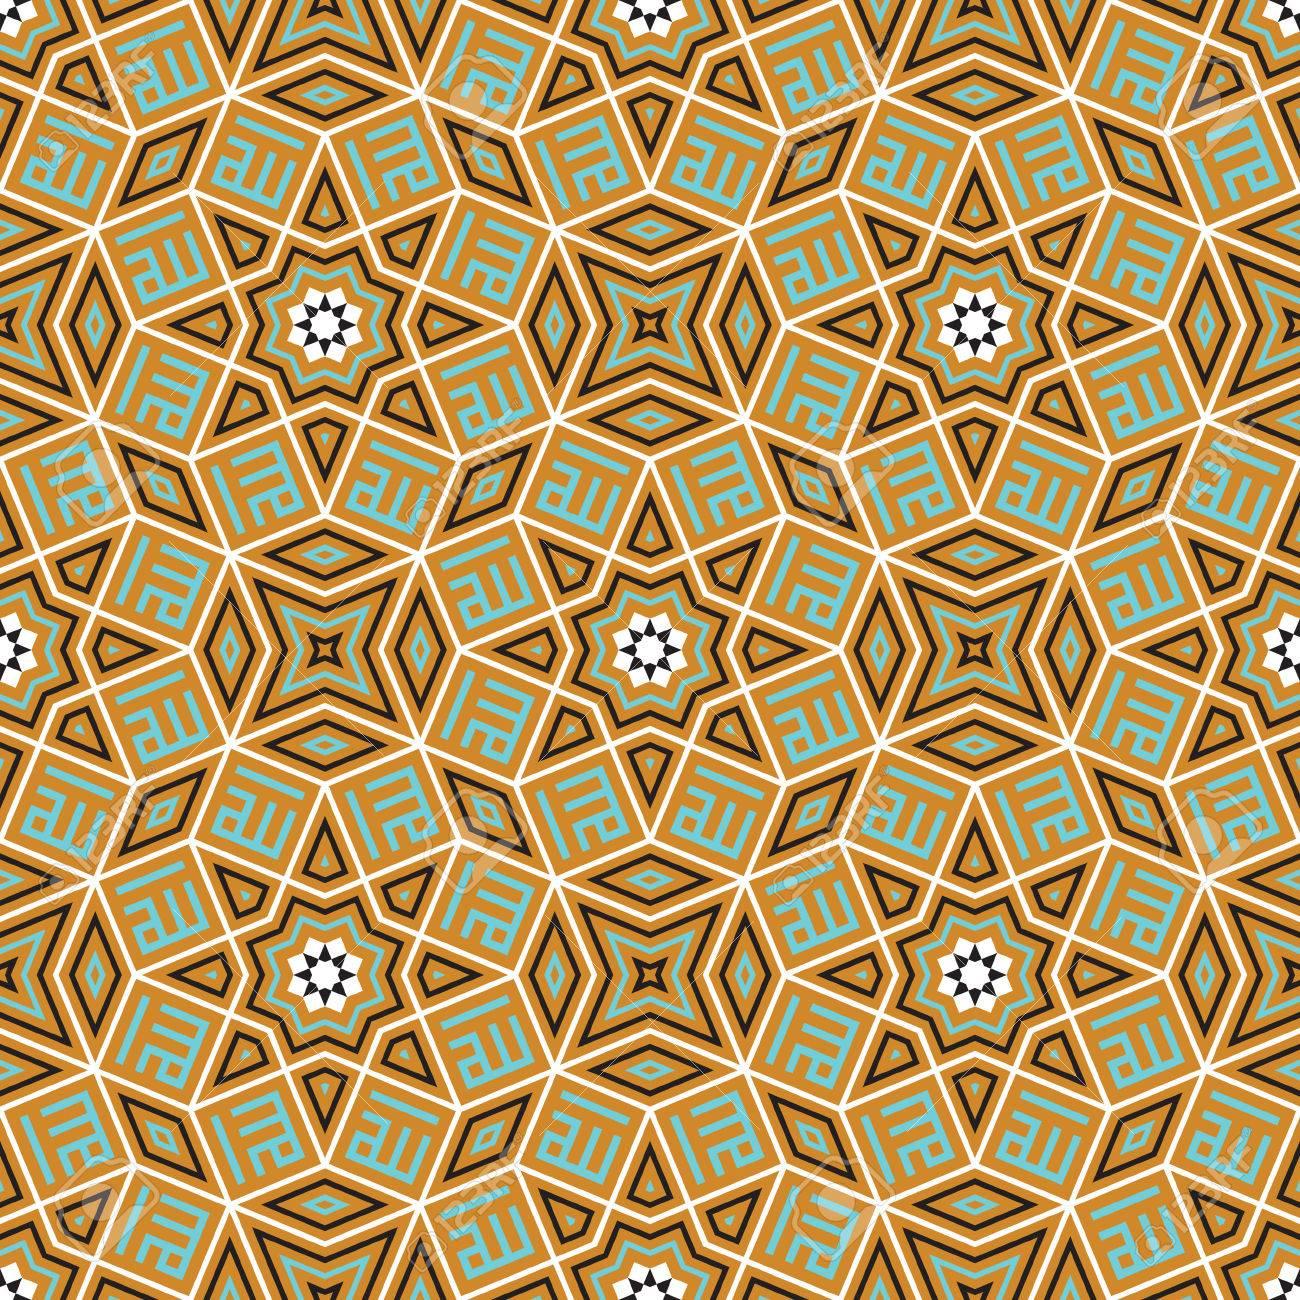 Arabic Seamless Pattern with Islamic calligraphy of dua(wish)